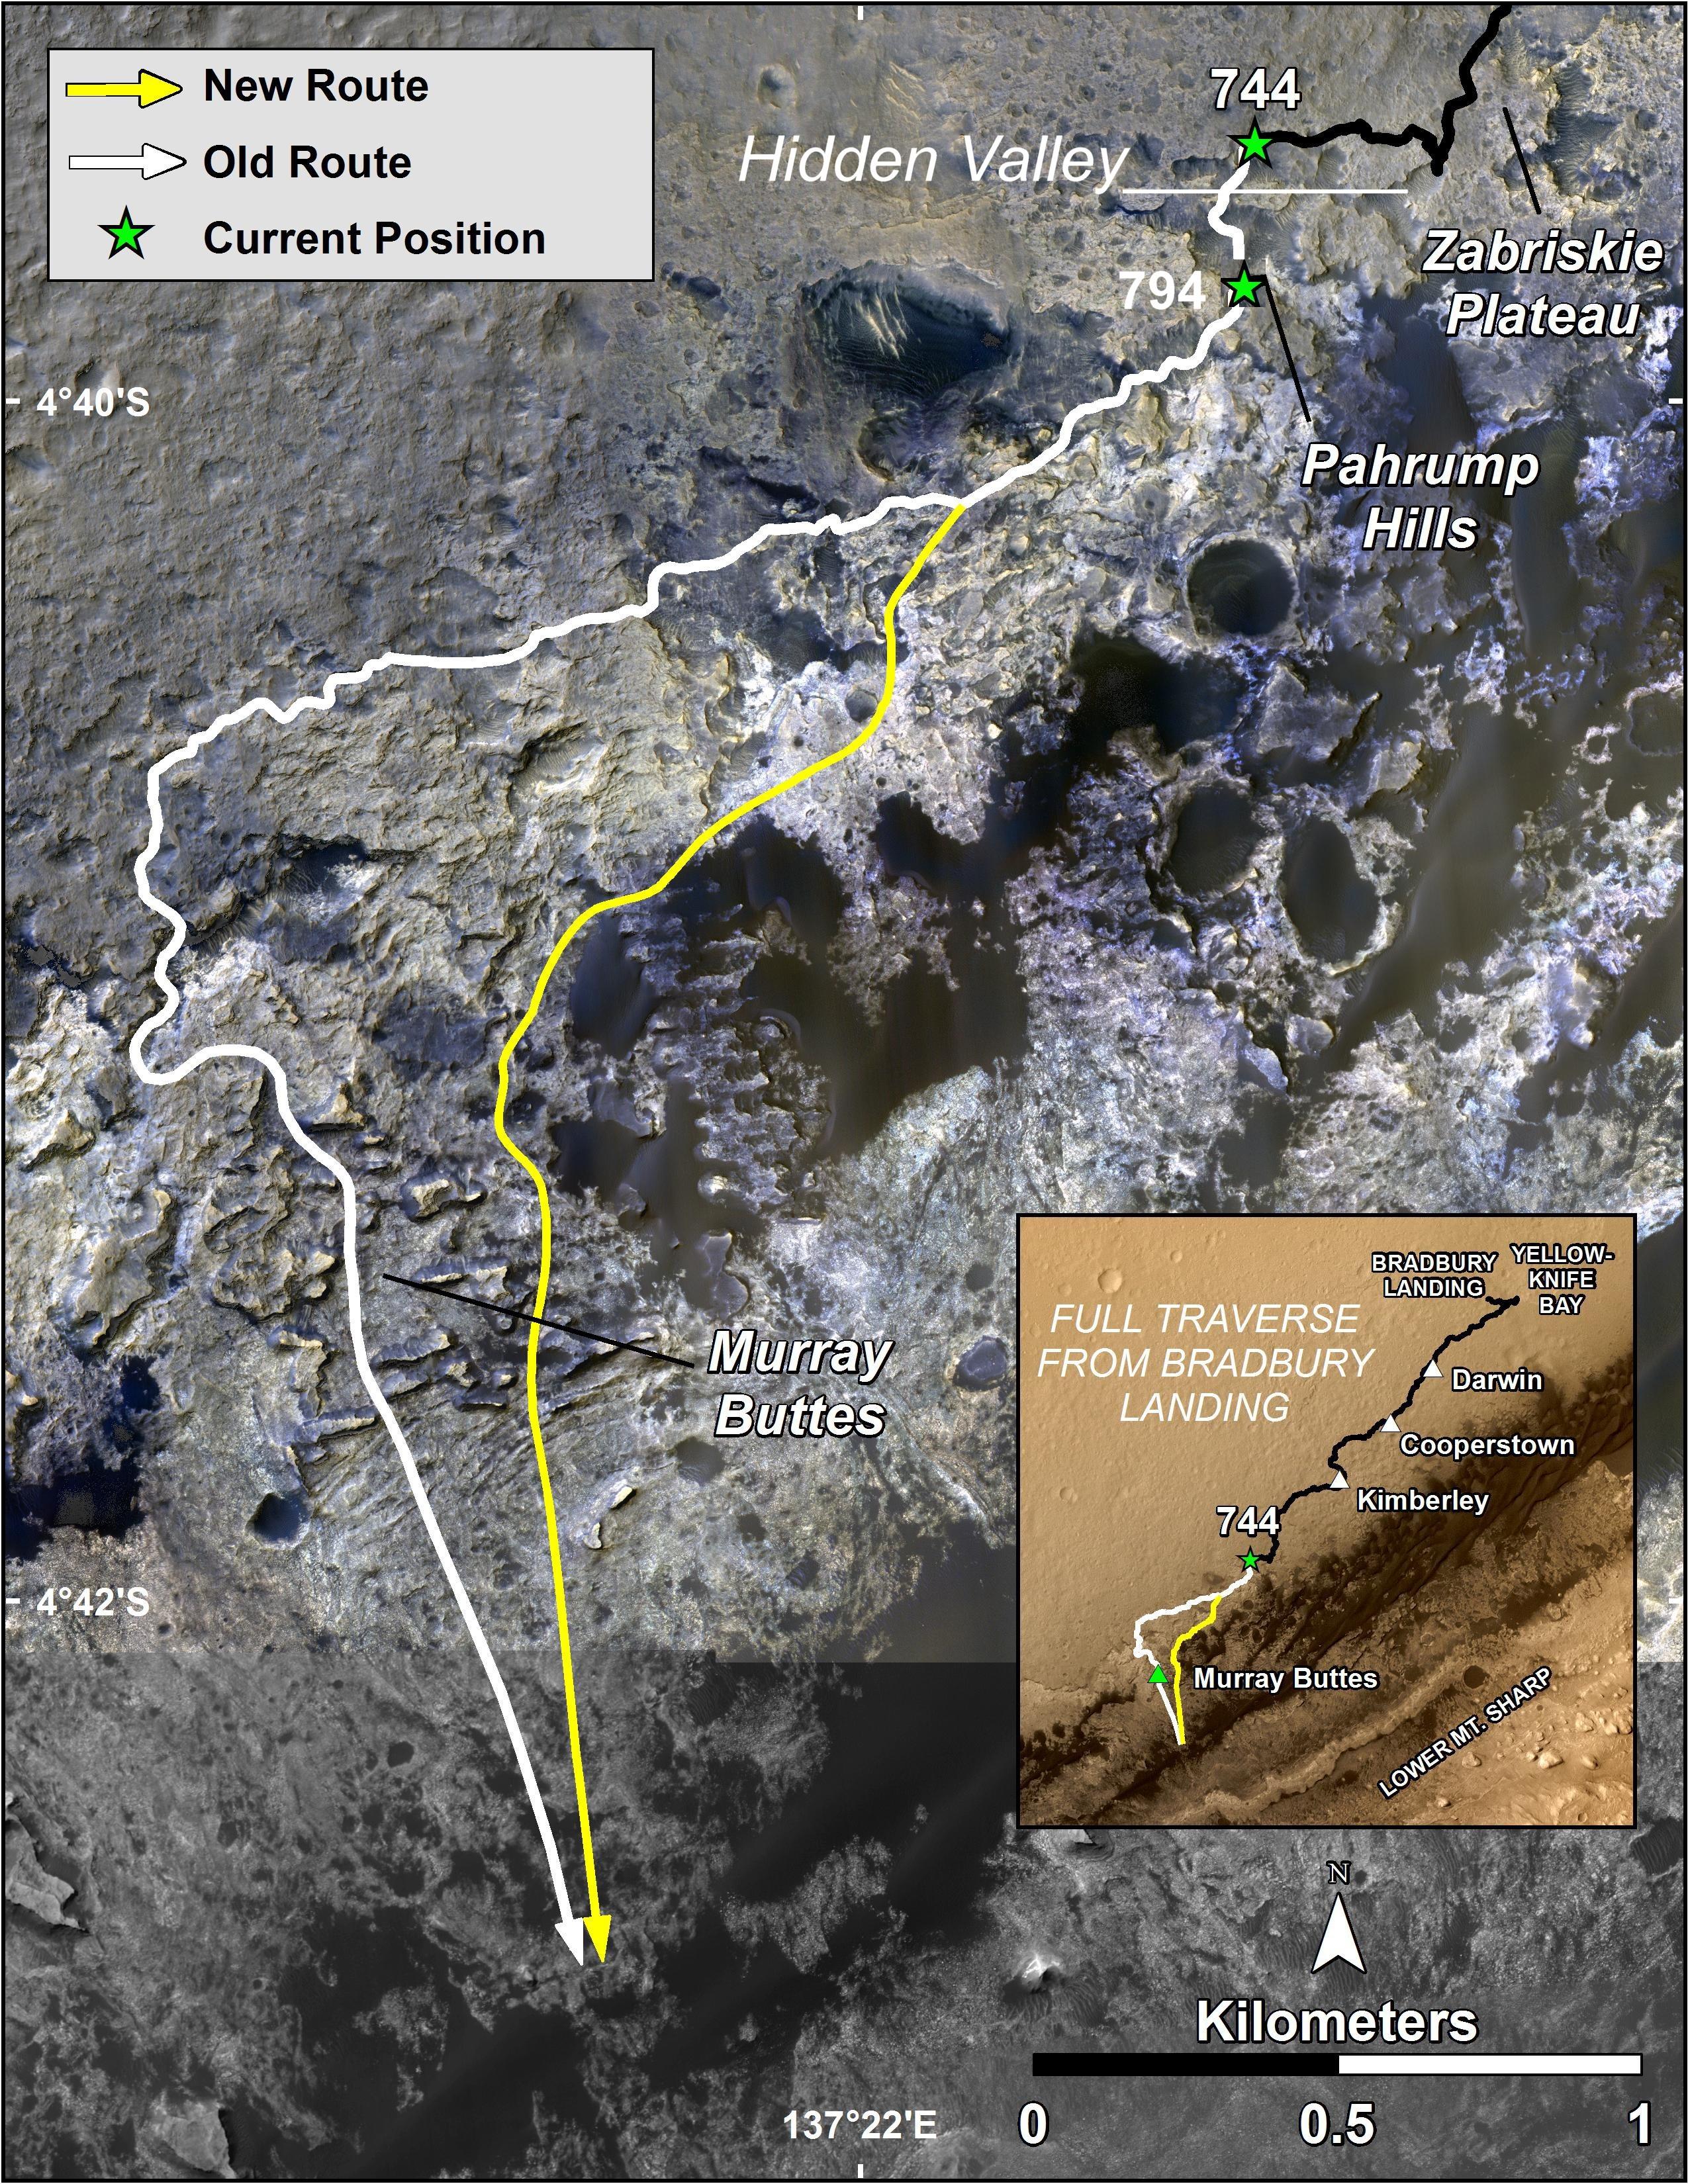 nasa-msl-mro-curiosity-rover-hirise-traverse-map-pahrump-hills-pia18475-full-renseigné2